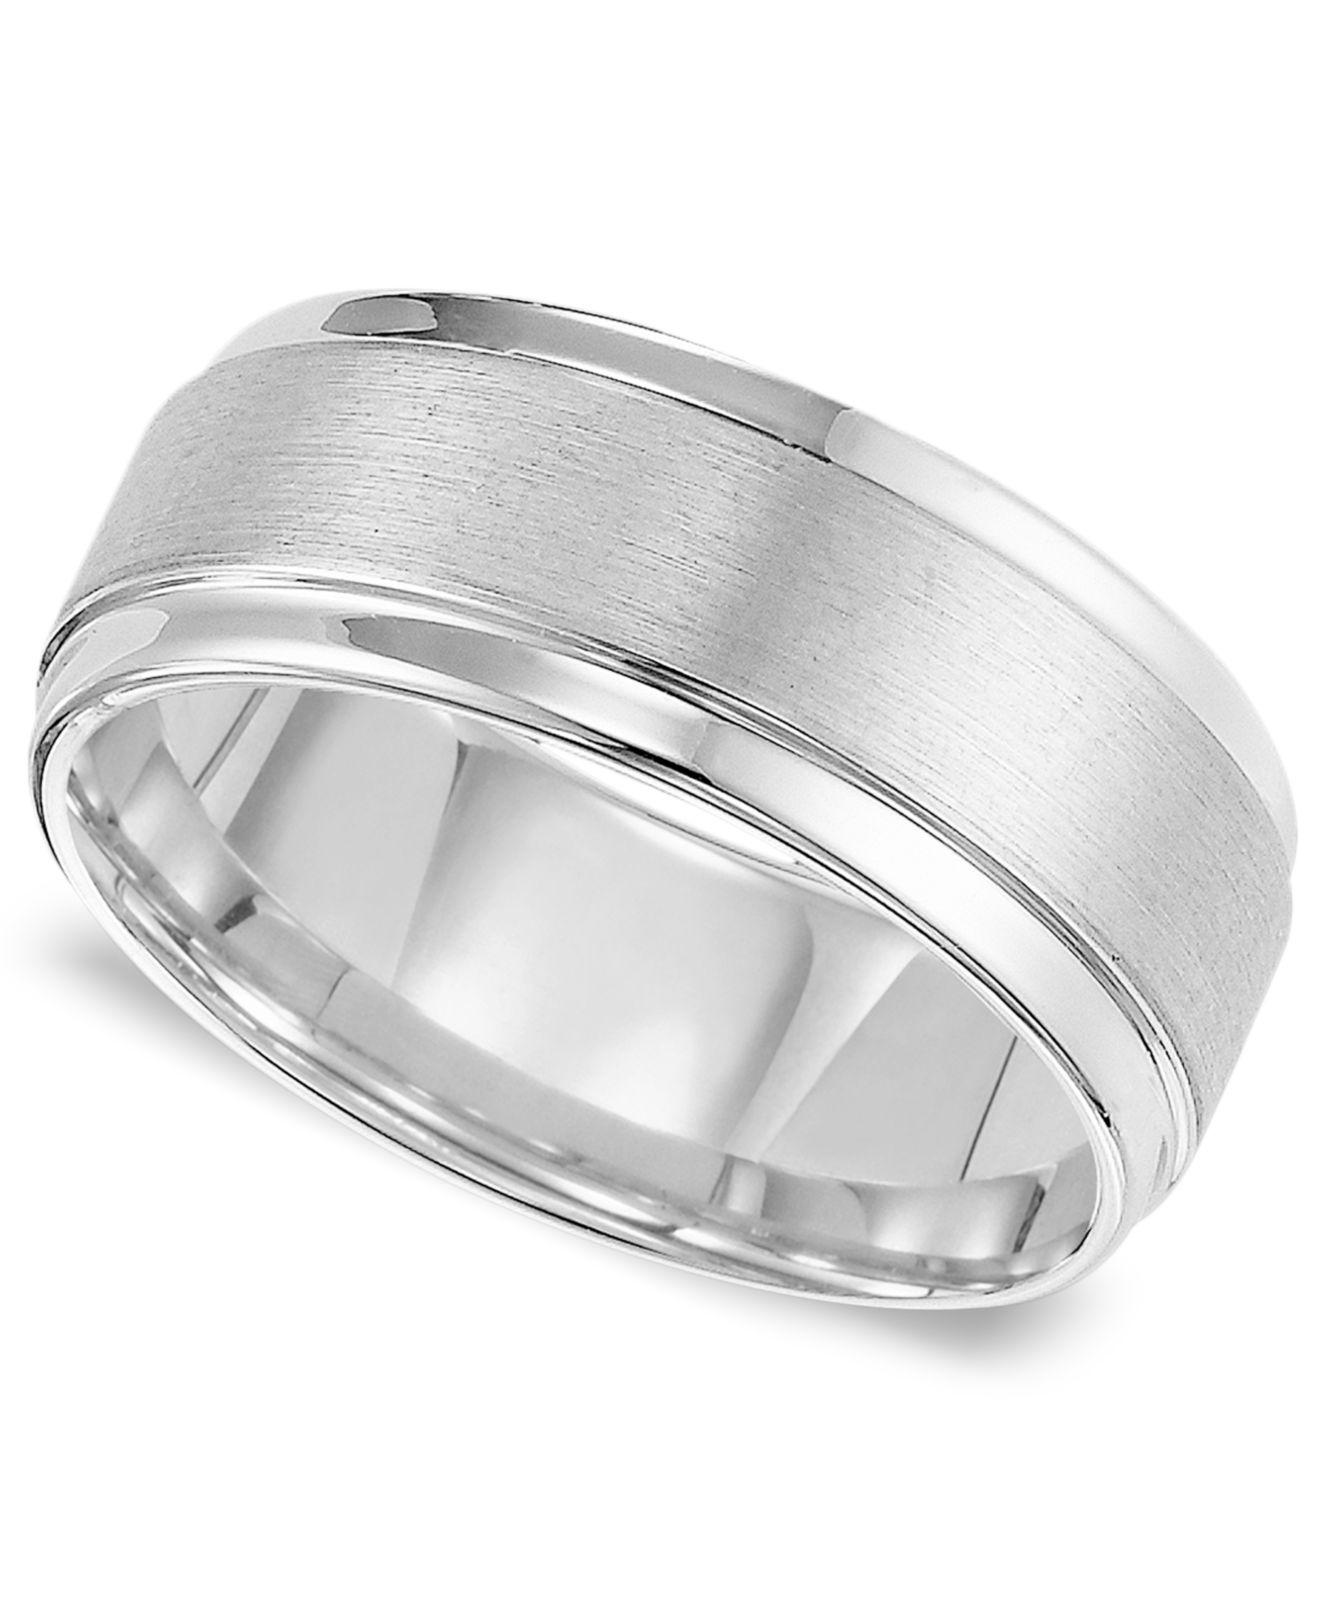 Triton Metallic Men S White Tungsten Carbide Ring Comfort Fit Wedding